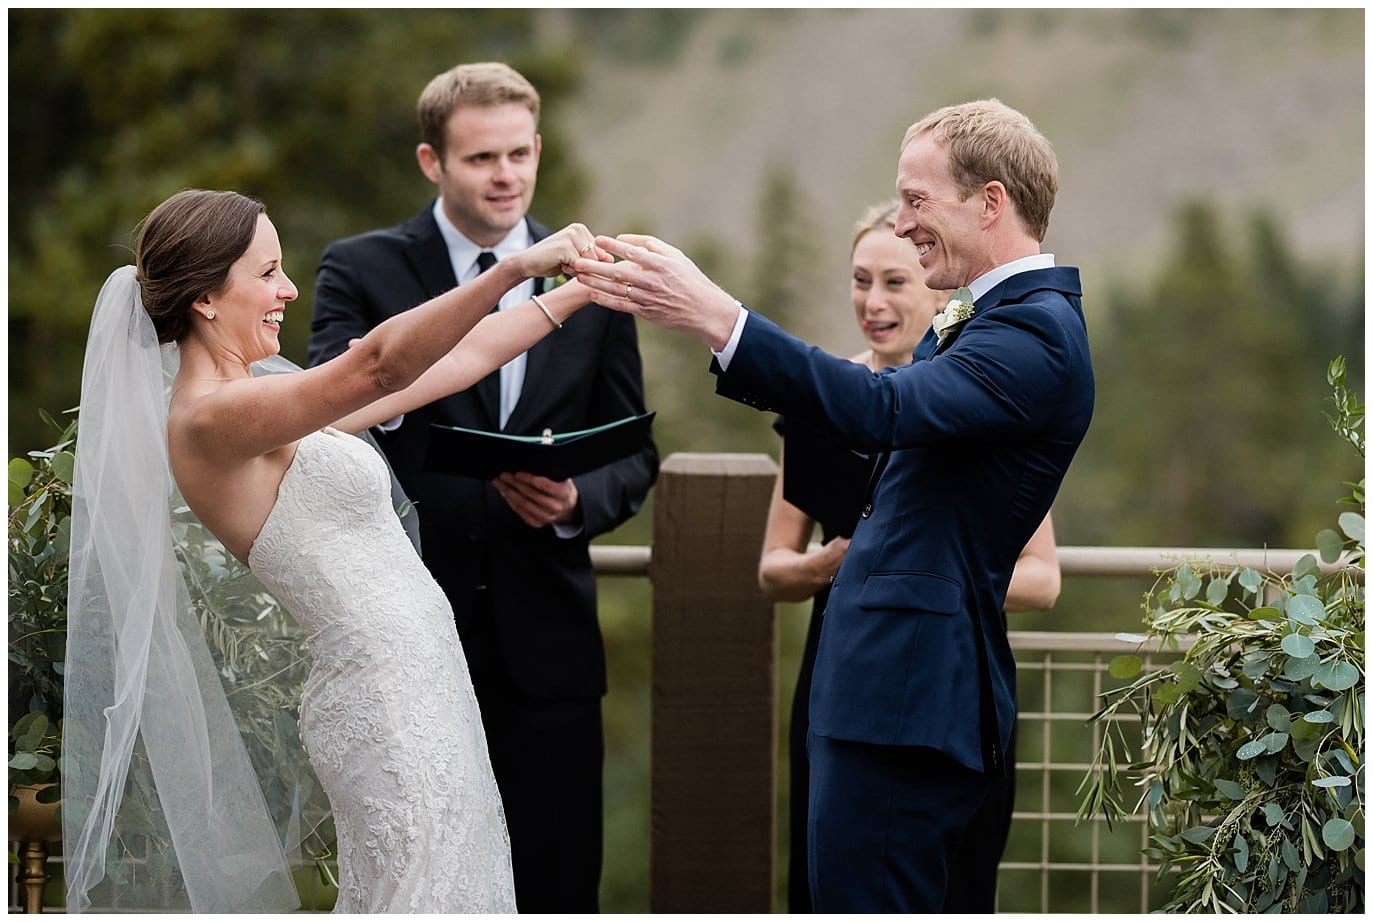 excited couple at wedding ceremony at Arapahoe Basin Black Mountain Lodge Wedding by Arapahoe Basin Wedding Photographer Jennie Crate